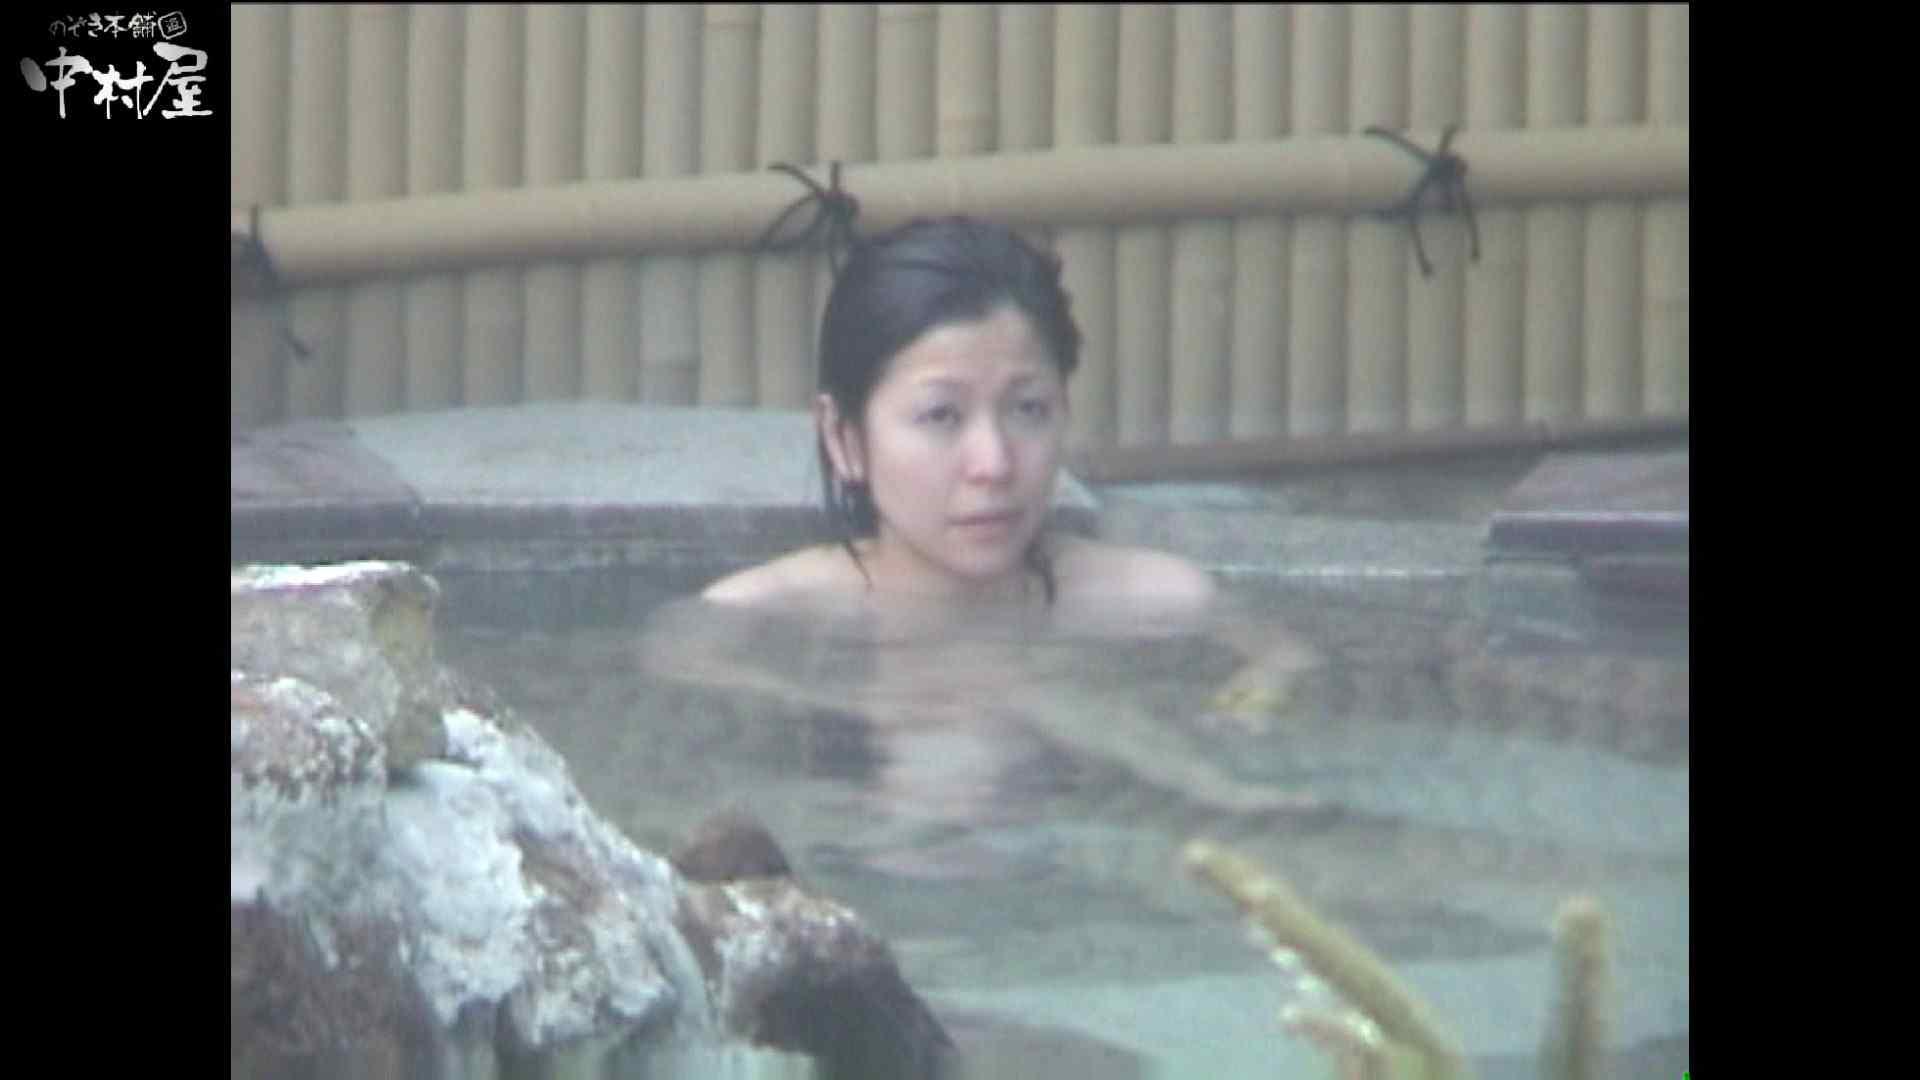 Aquaな露天風呂Vol.986 盗撮  94連発 55